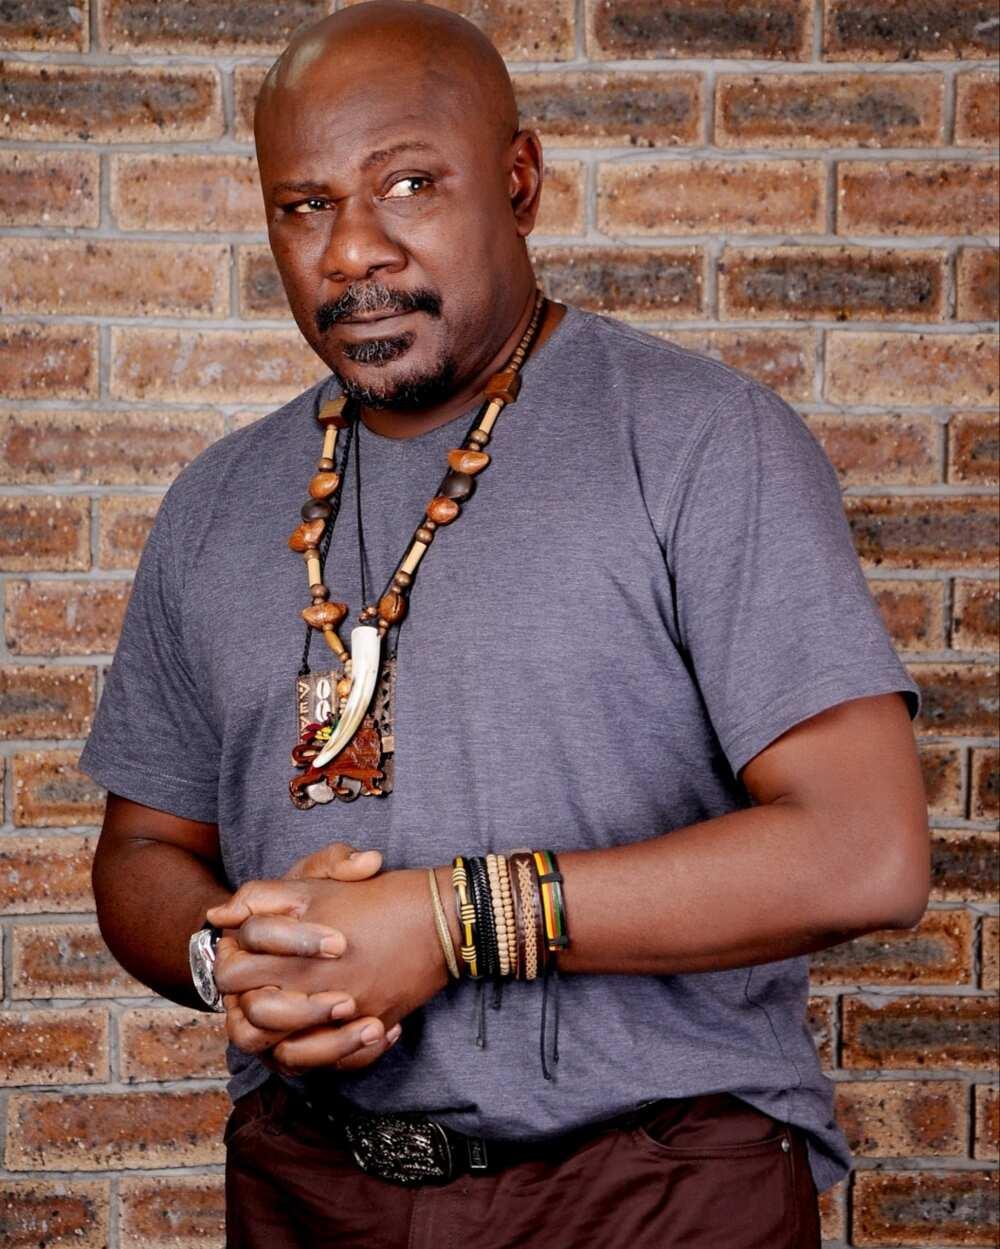 Top 20 richest Nollywood actors in Nigeria